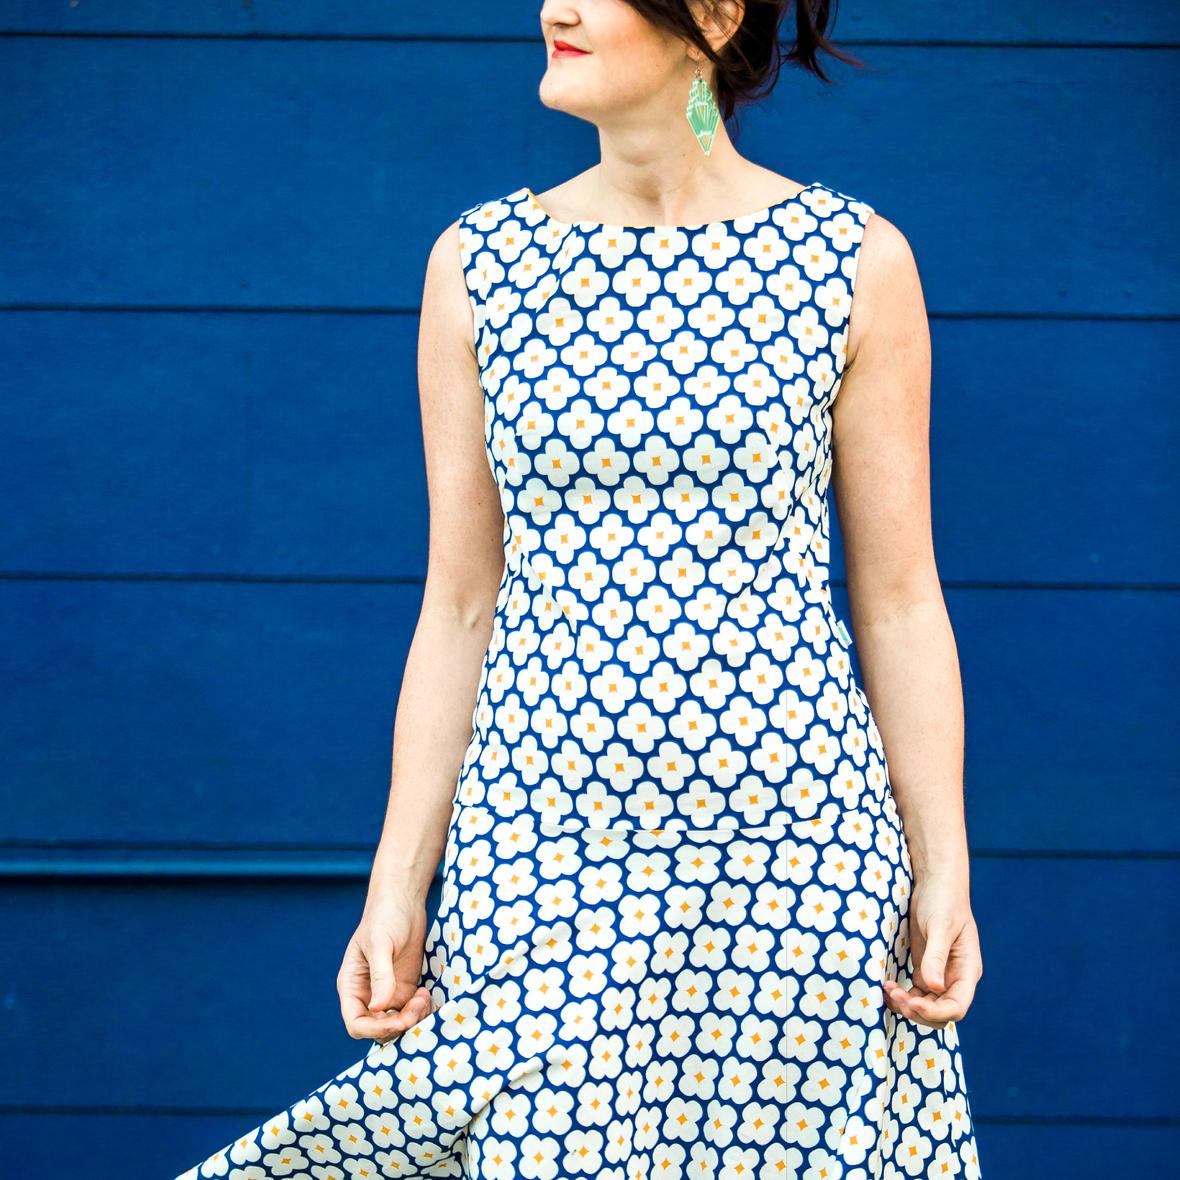 a dress 2 SITE